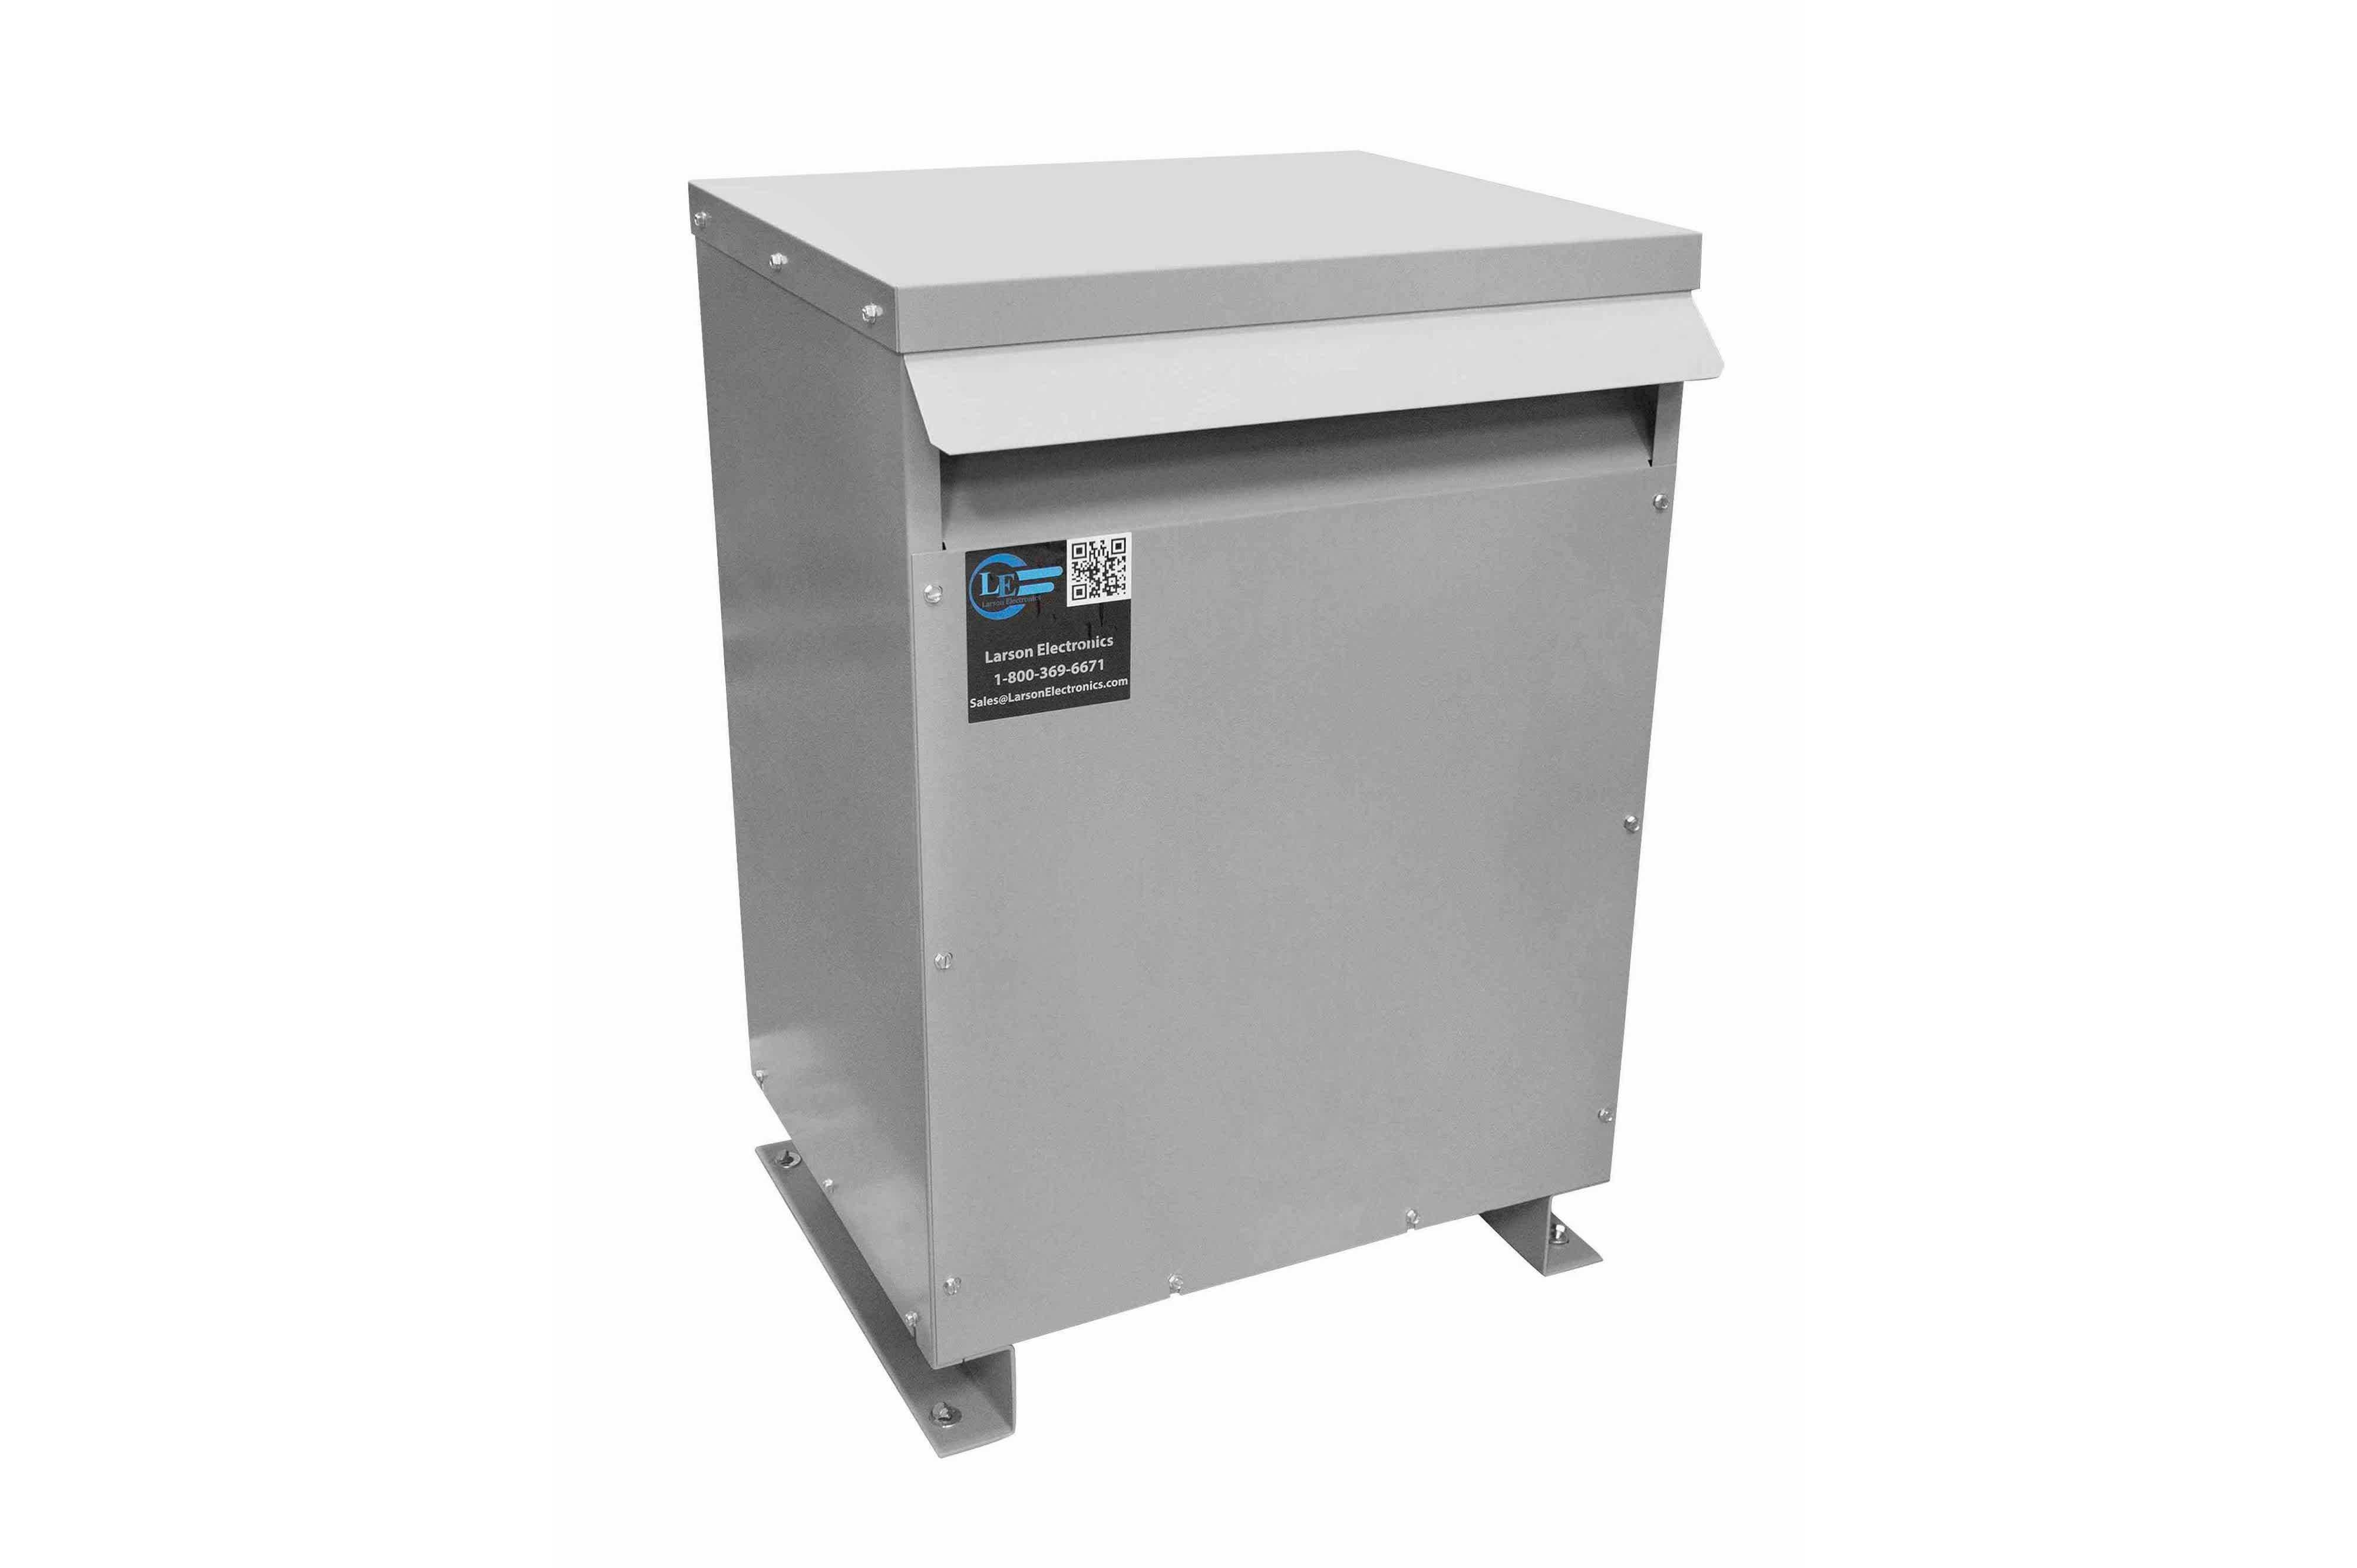 137.5 kVA 3PH Isolation Transformer, 400V Wye Primary, 480Y/277 Wye-N Secondary, N3R, Ventilated, 60 Hz